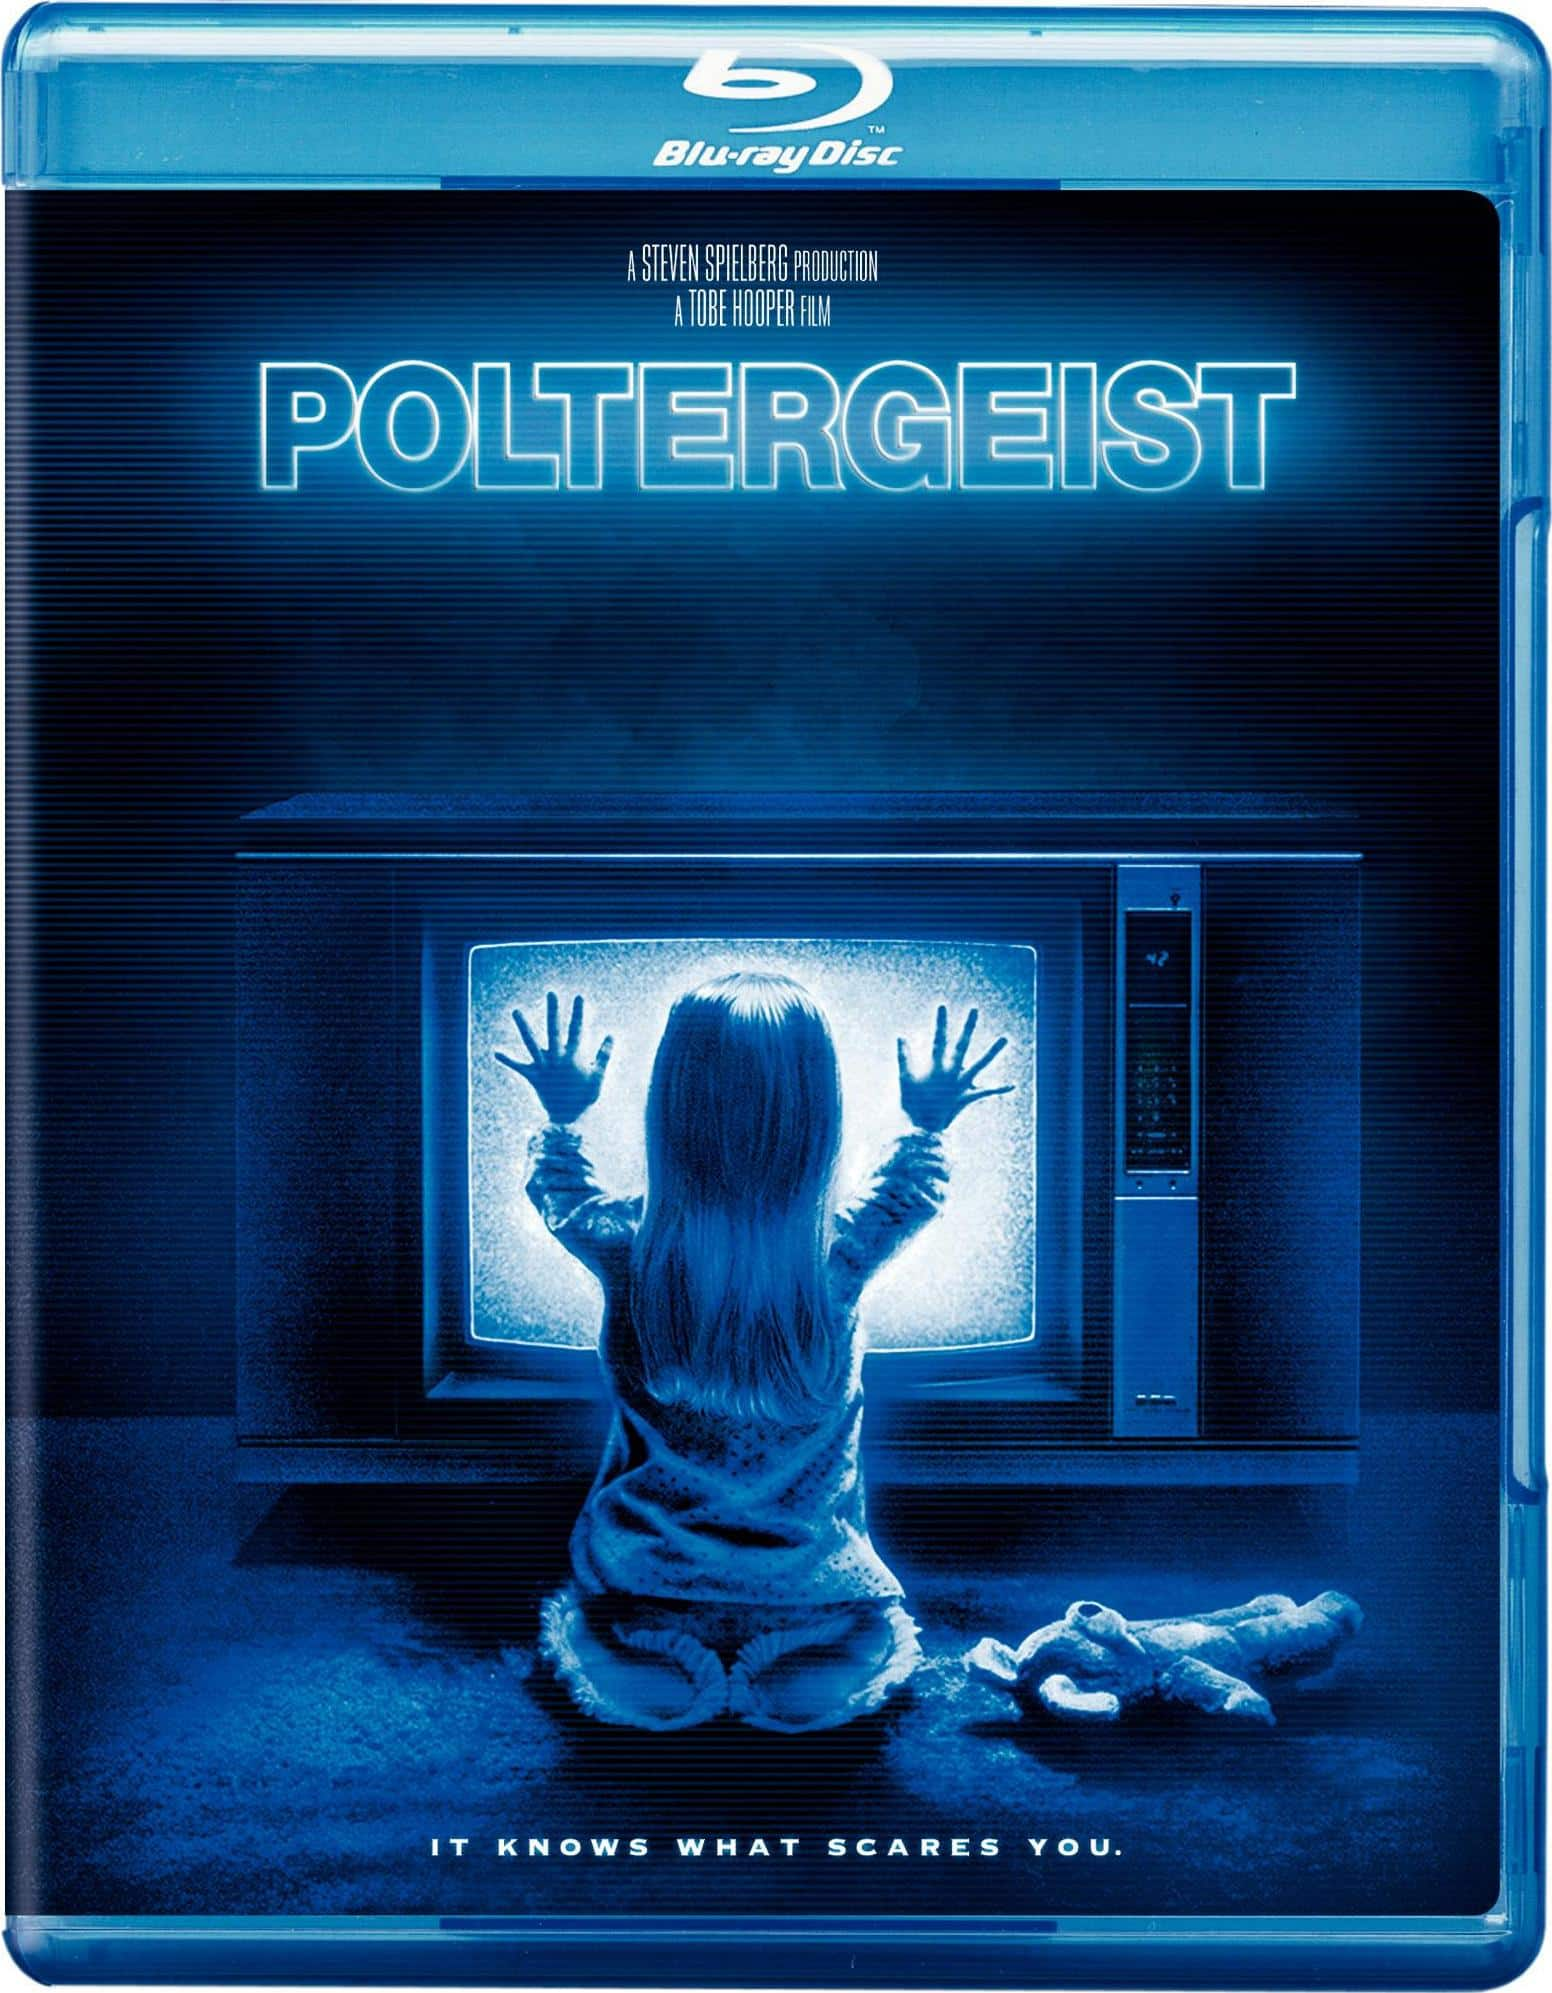 Poltergeist [Blu-ray] - $5